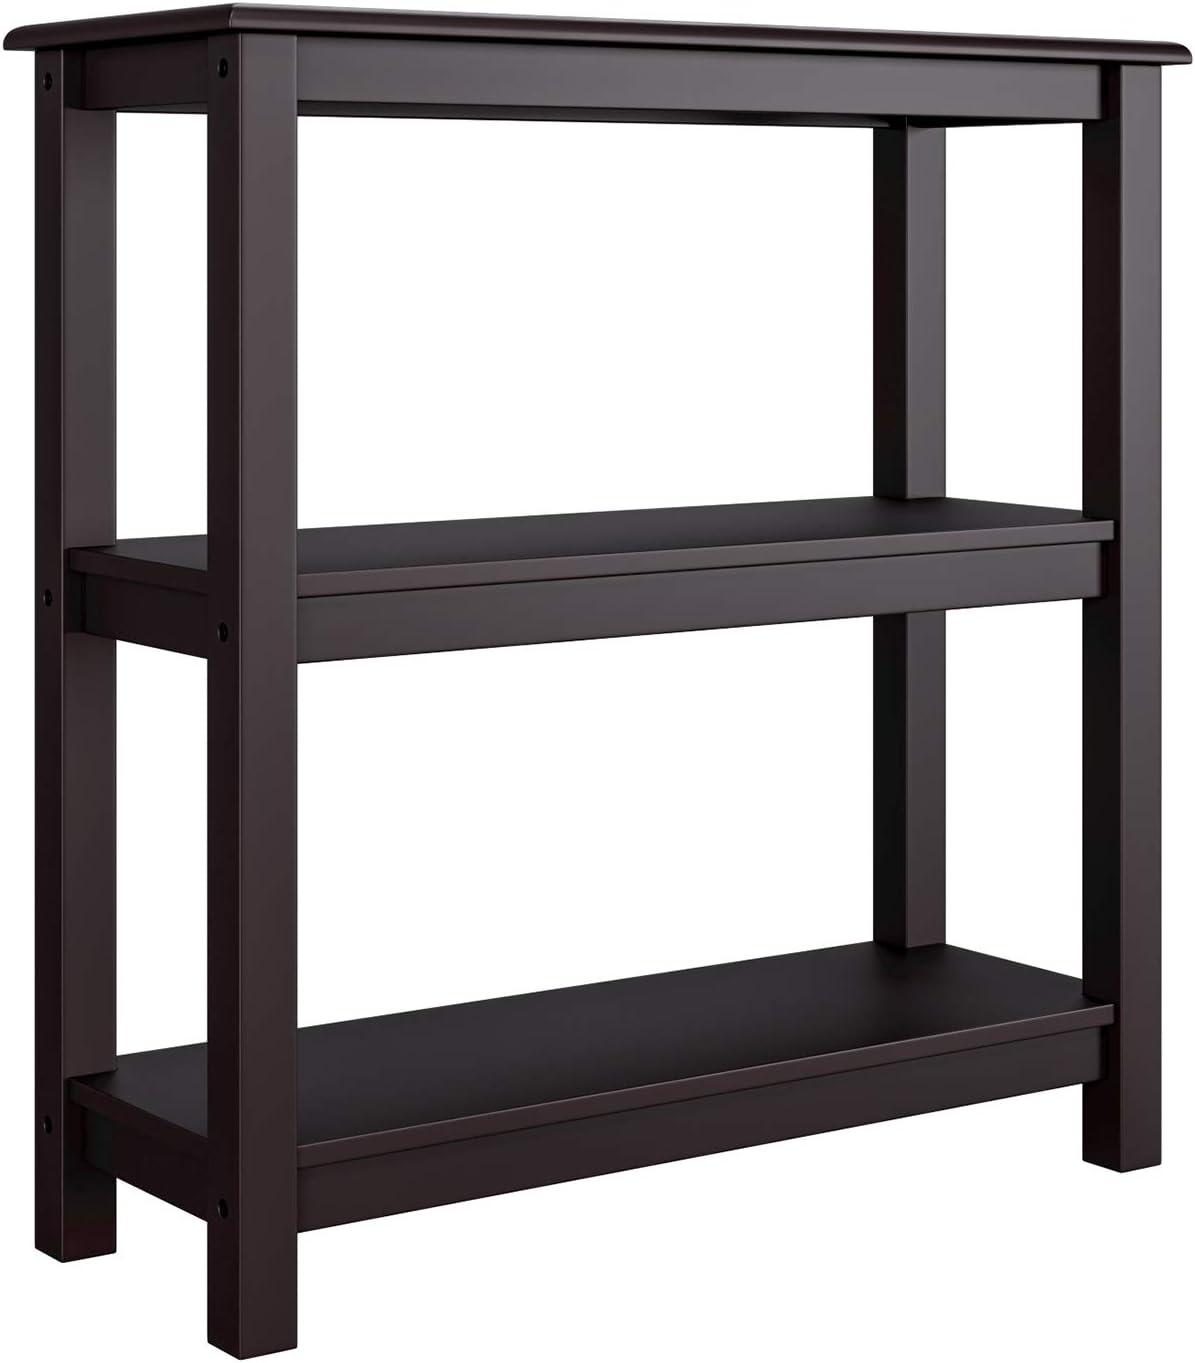 Homfa 3 Tier Shelving Unit Wooden Storage Rack Standing Organiser Shelves Side Table Shoe Rack for Living Room Bedroom Bathroom Dark Brown 78x30x80cm